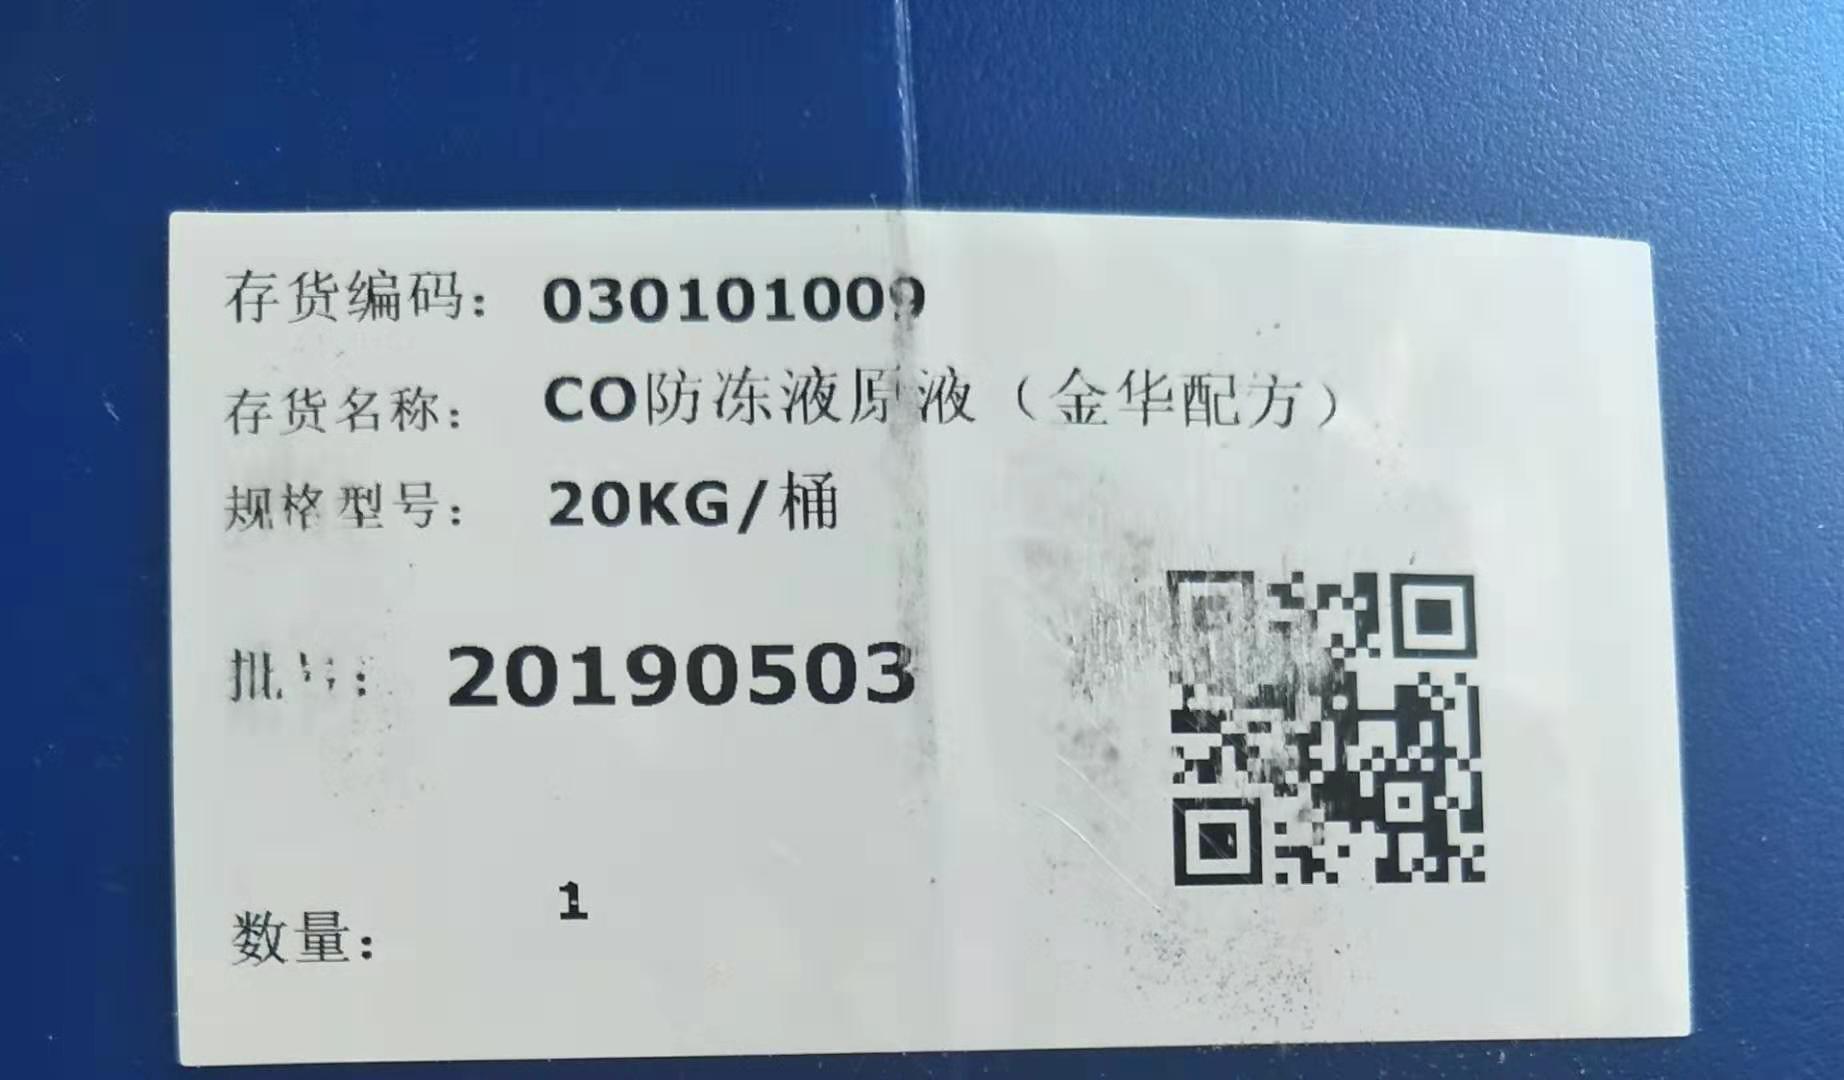 CO防冻液原液丨G48-24